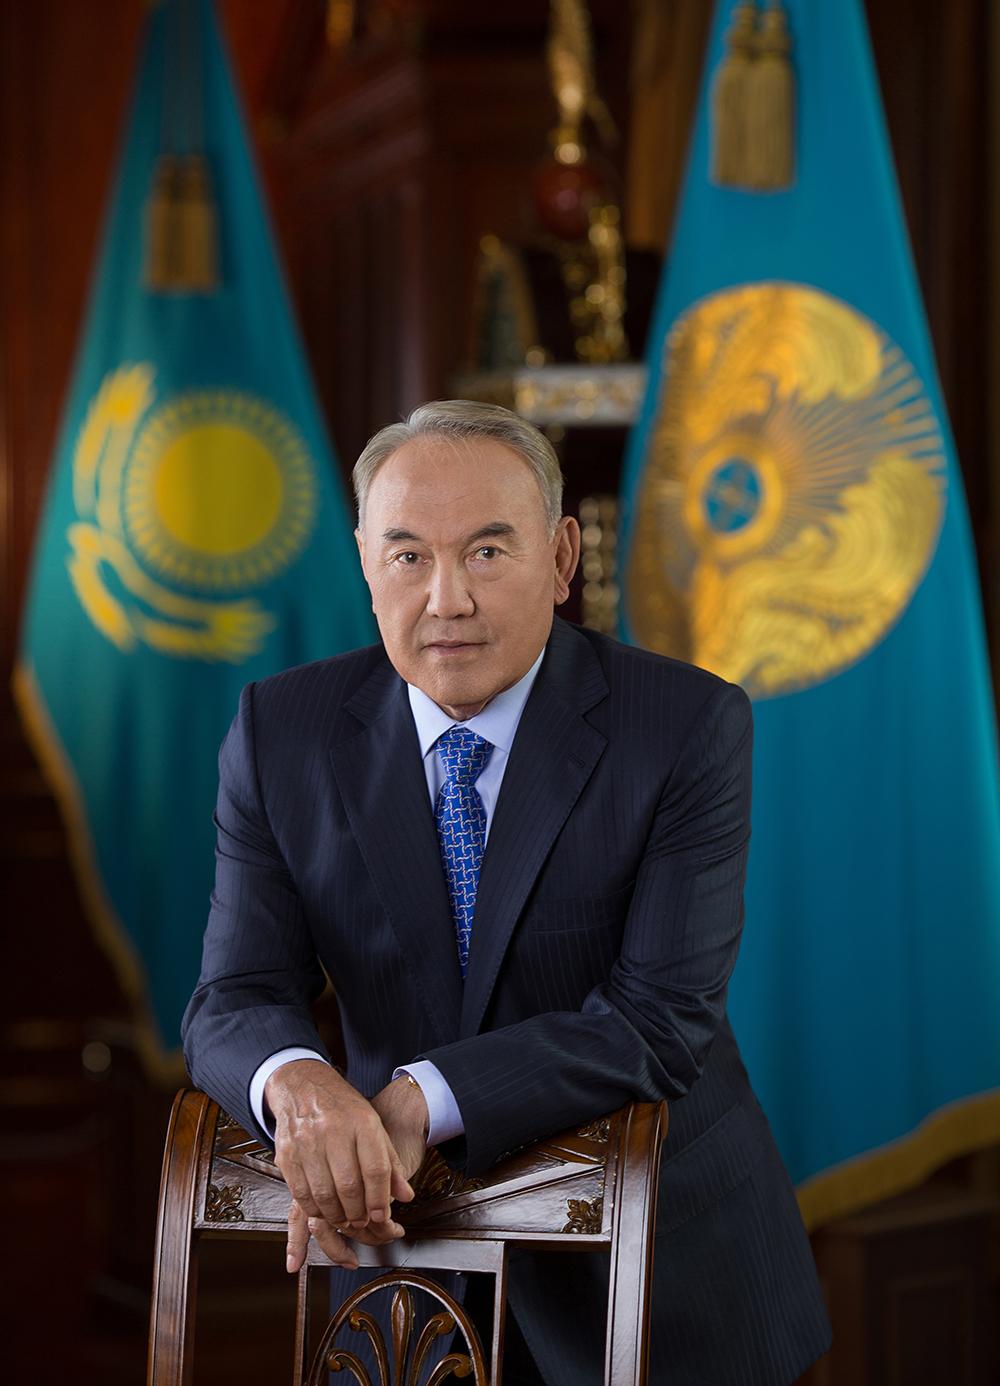 NURSULTAN ABISHEVICH NAZARBAYEV, preşedintele KAZAKHSTAN